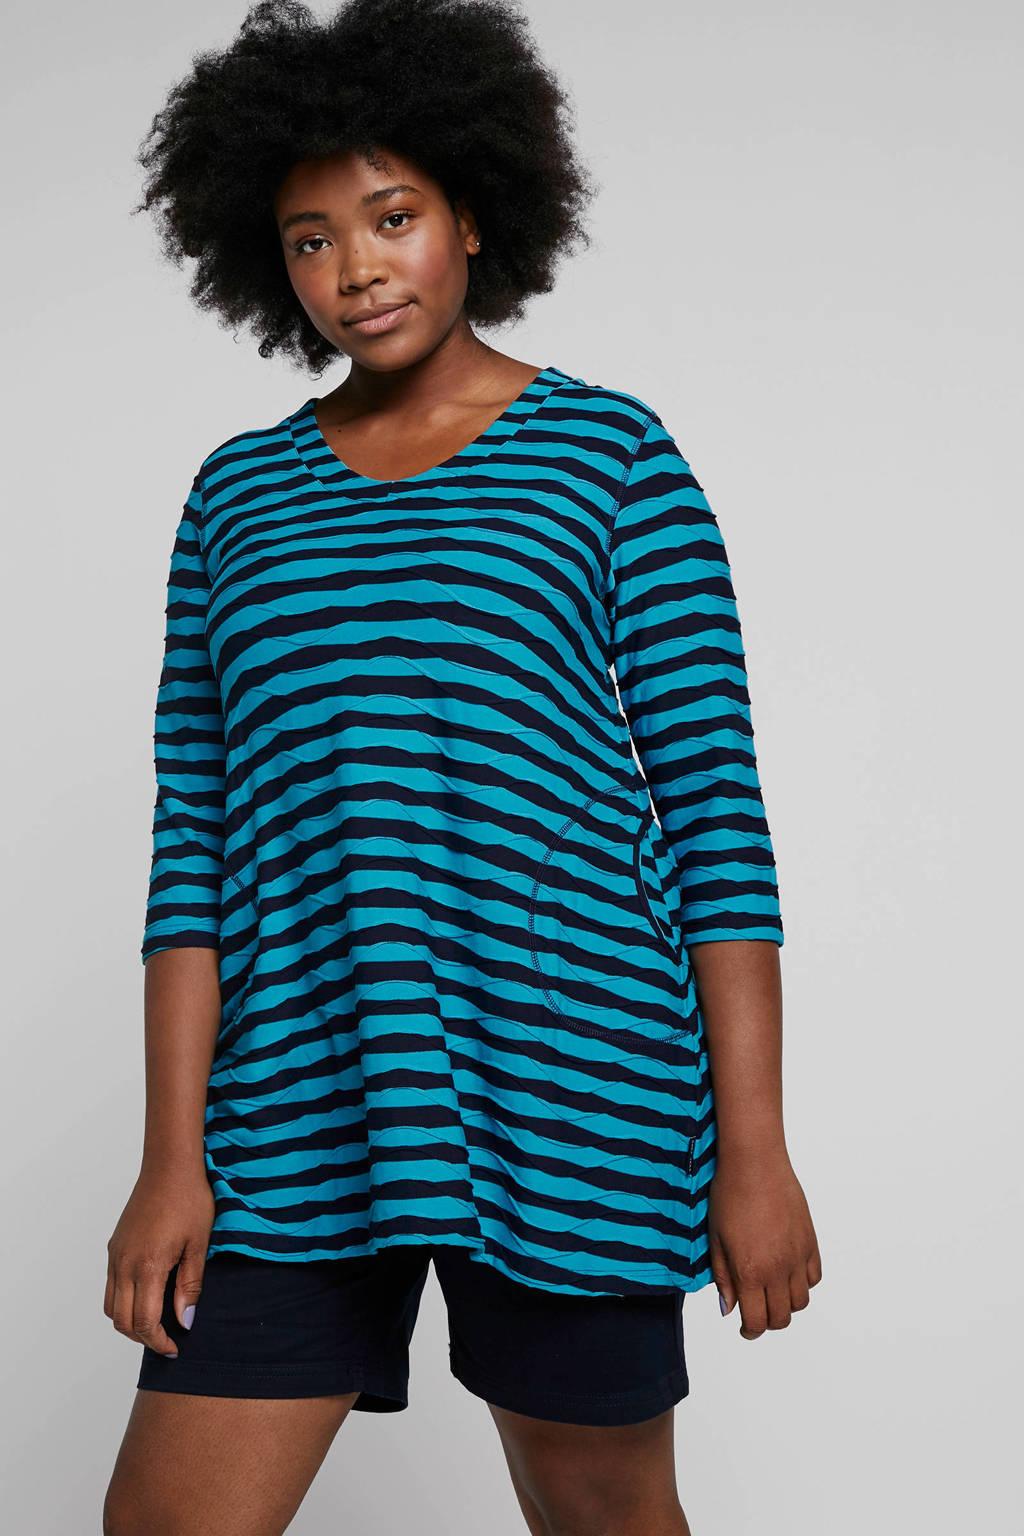 PONT NEUF tuniek met strepen, Blauw/zwart